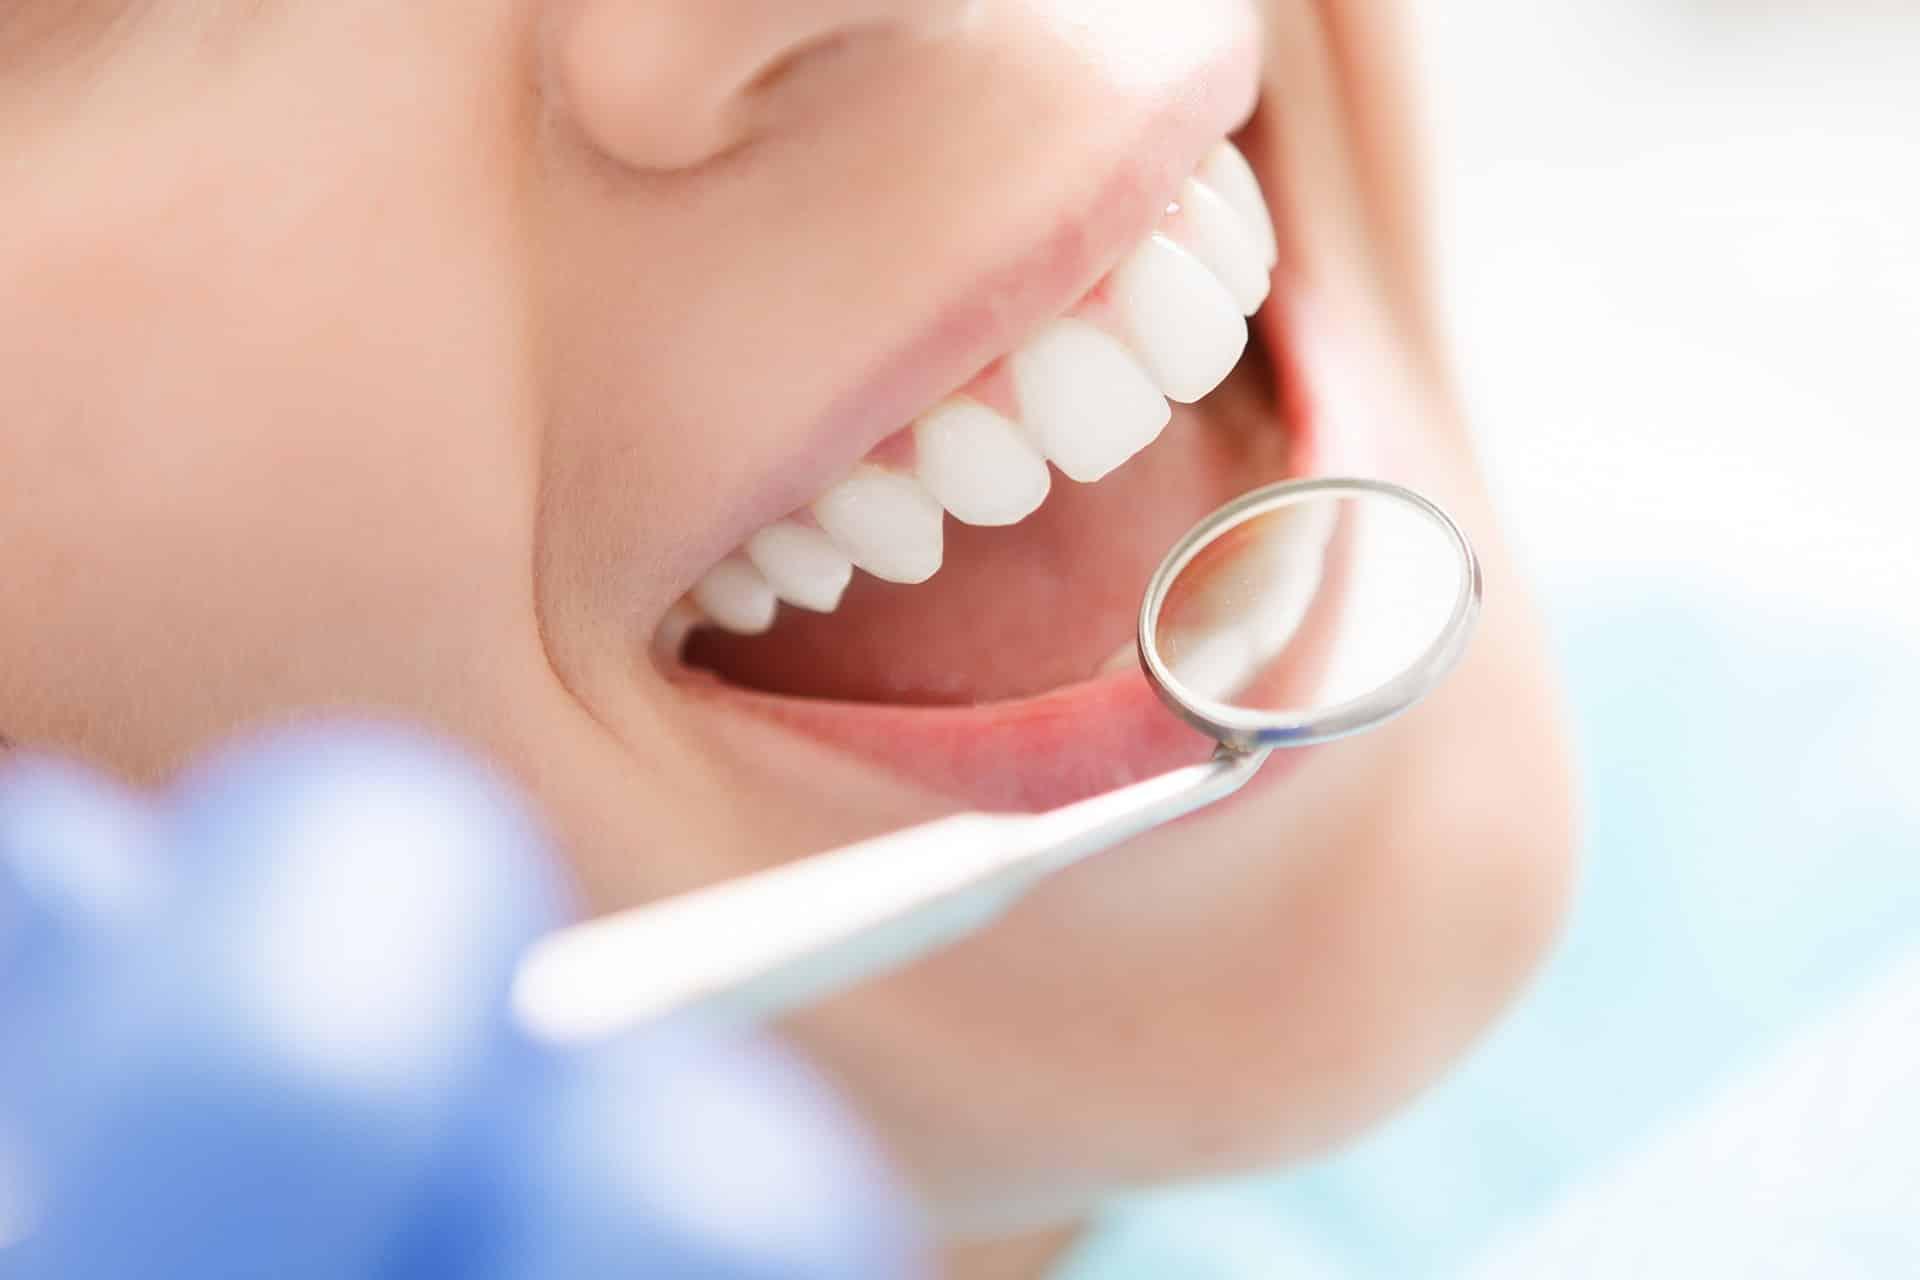 prevencion de la caries dental infantil